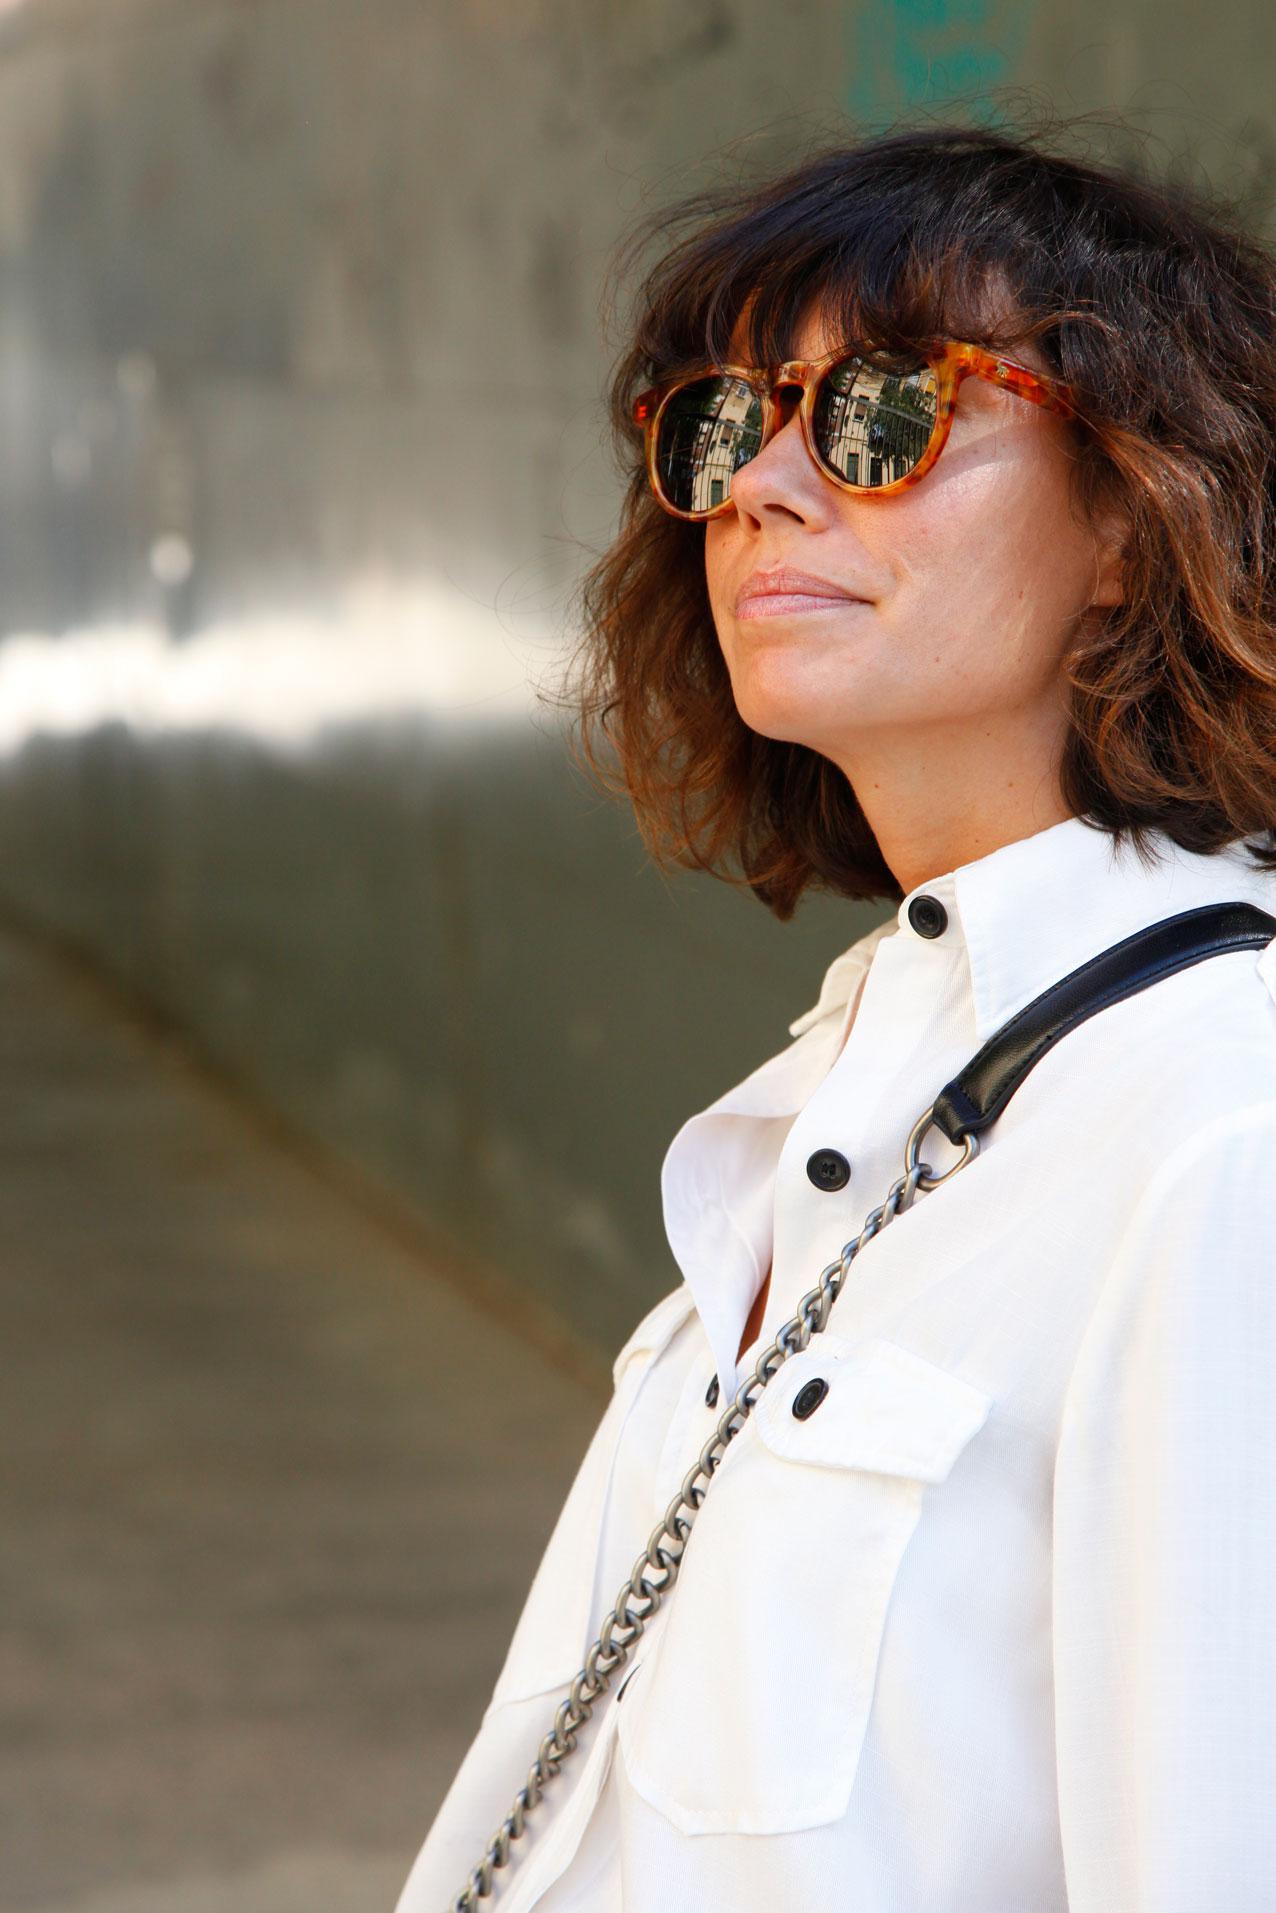 gucci_slippers_adn_denim_skirt_look-cool_lemonade4